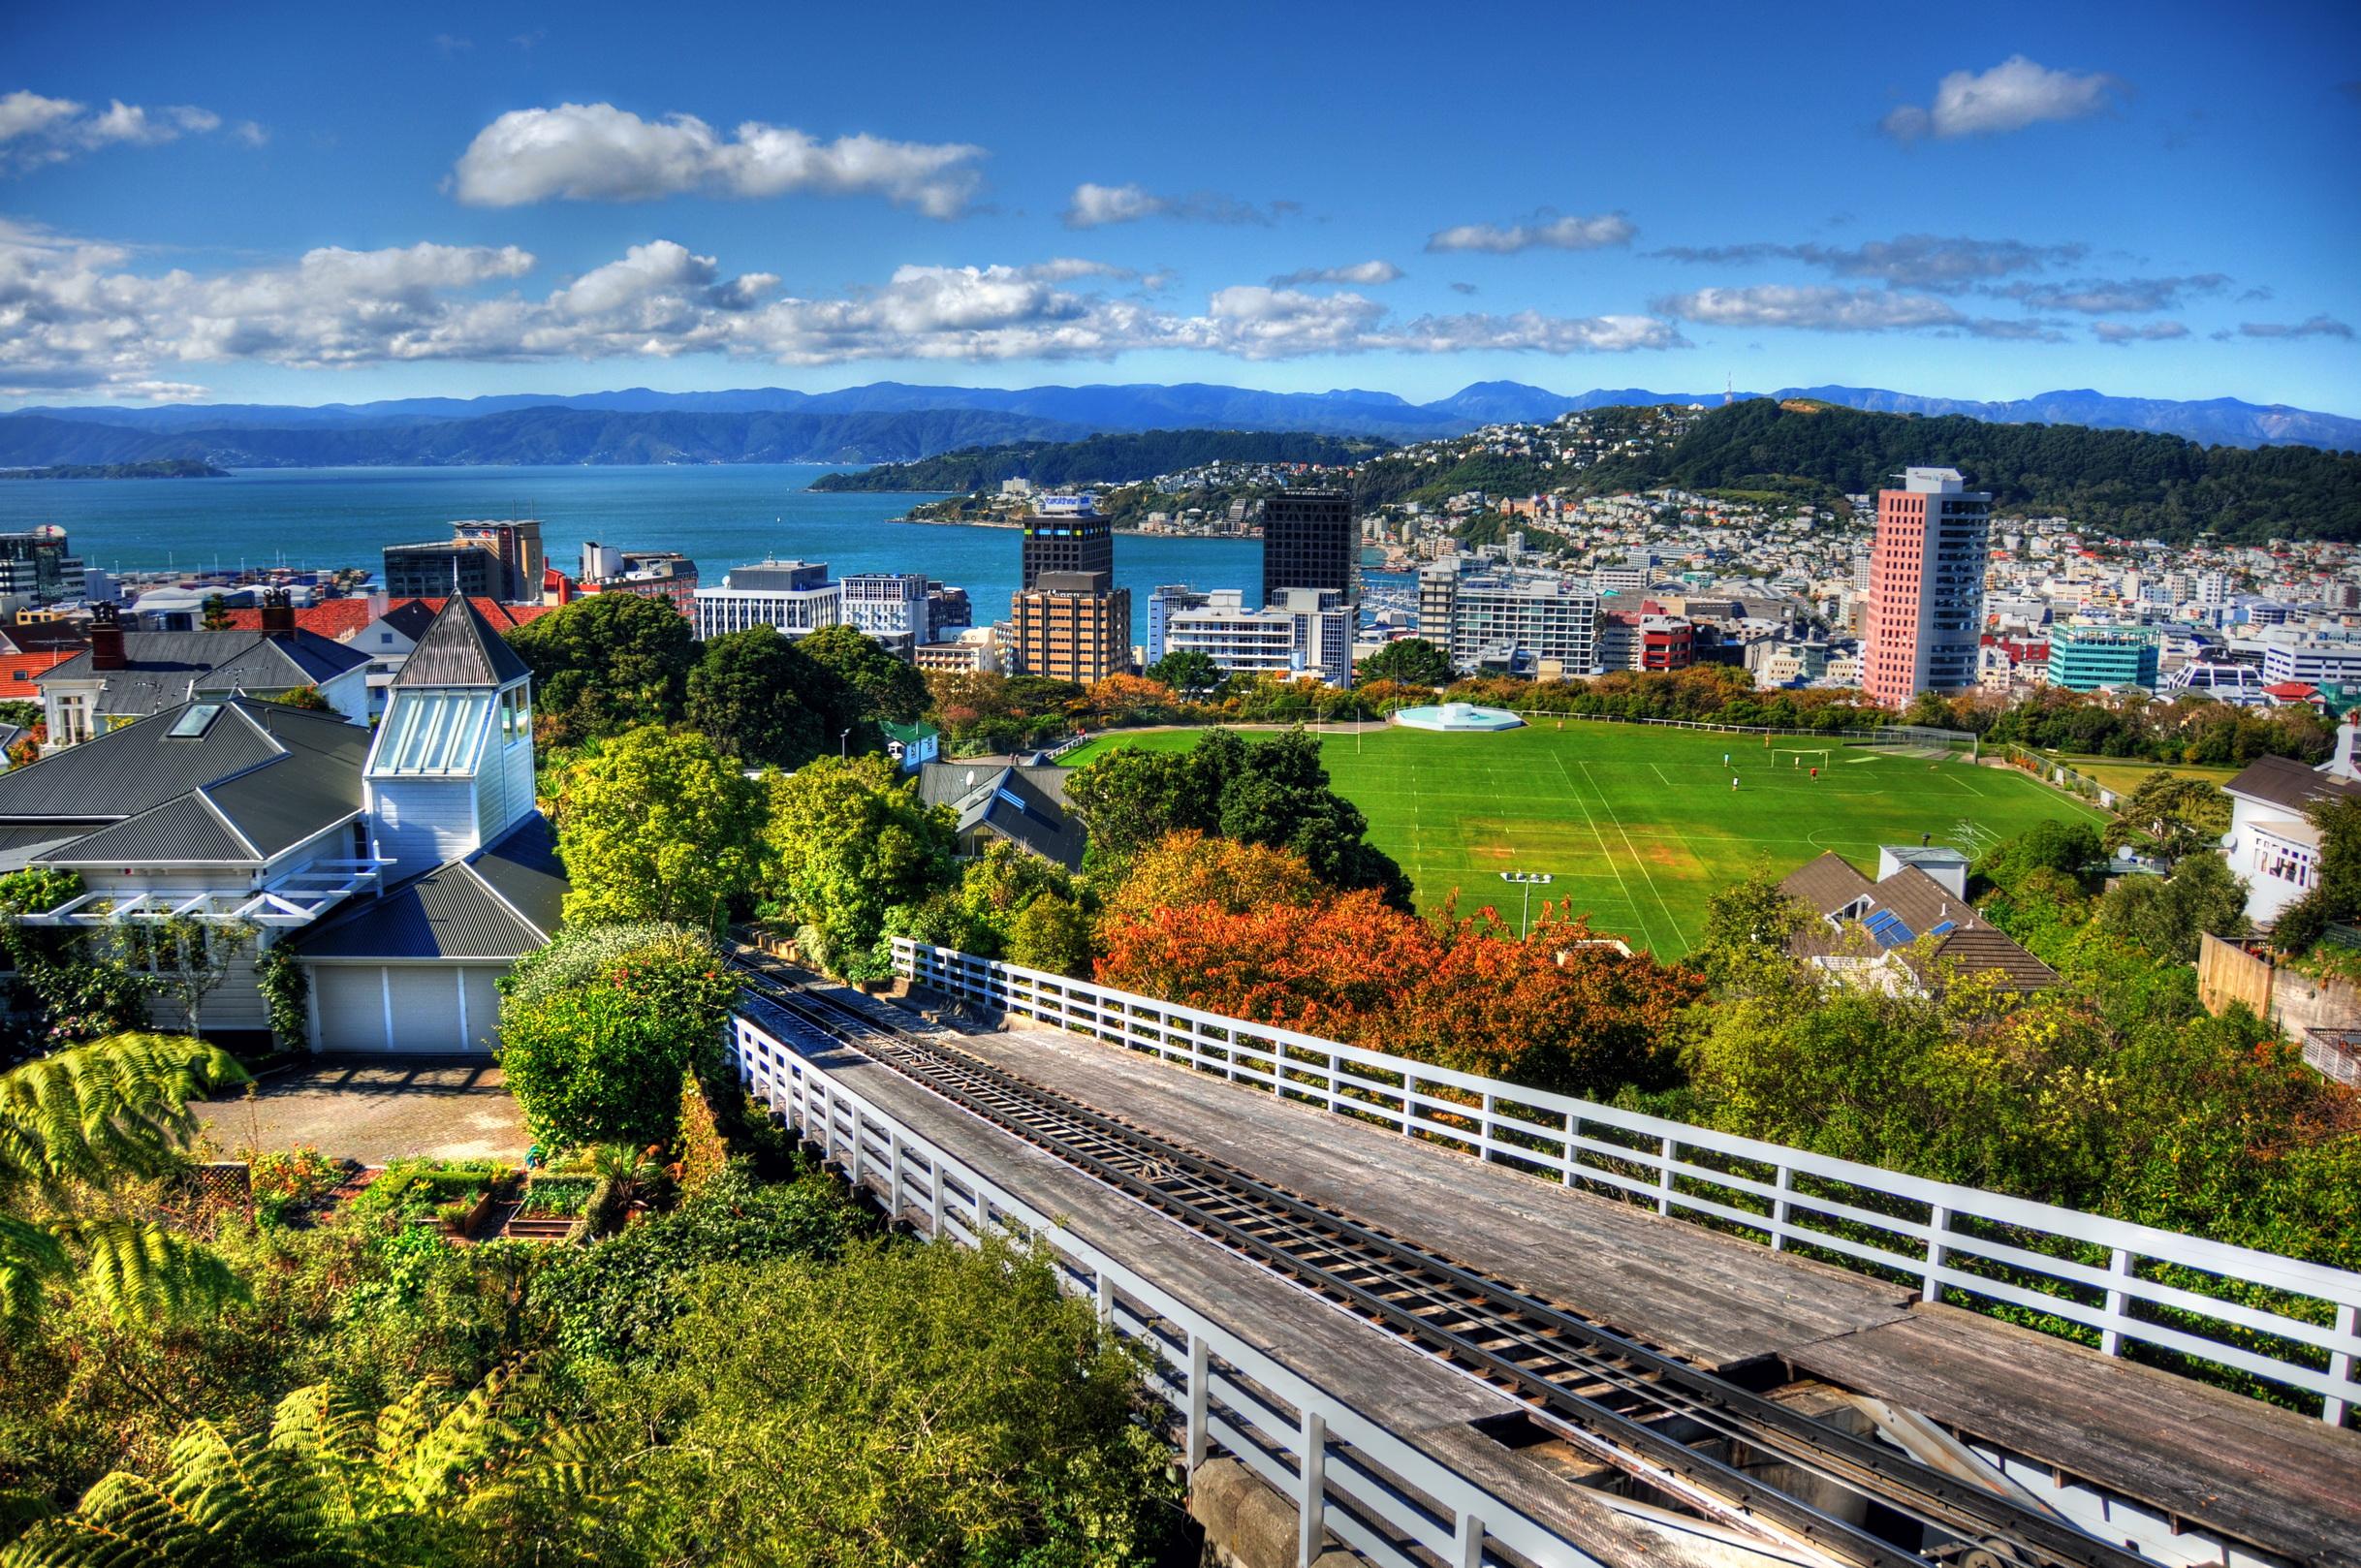 Picture New Zealand Wellington Cities 2436x1618 2436x1618